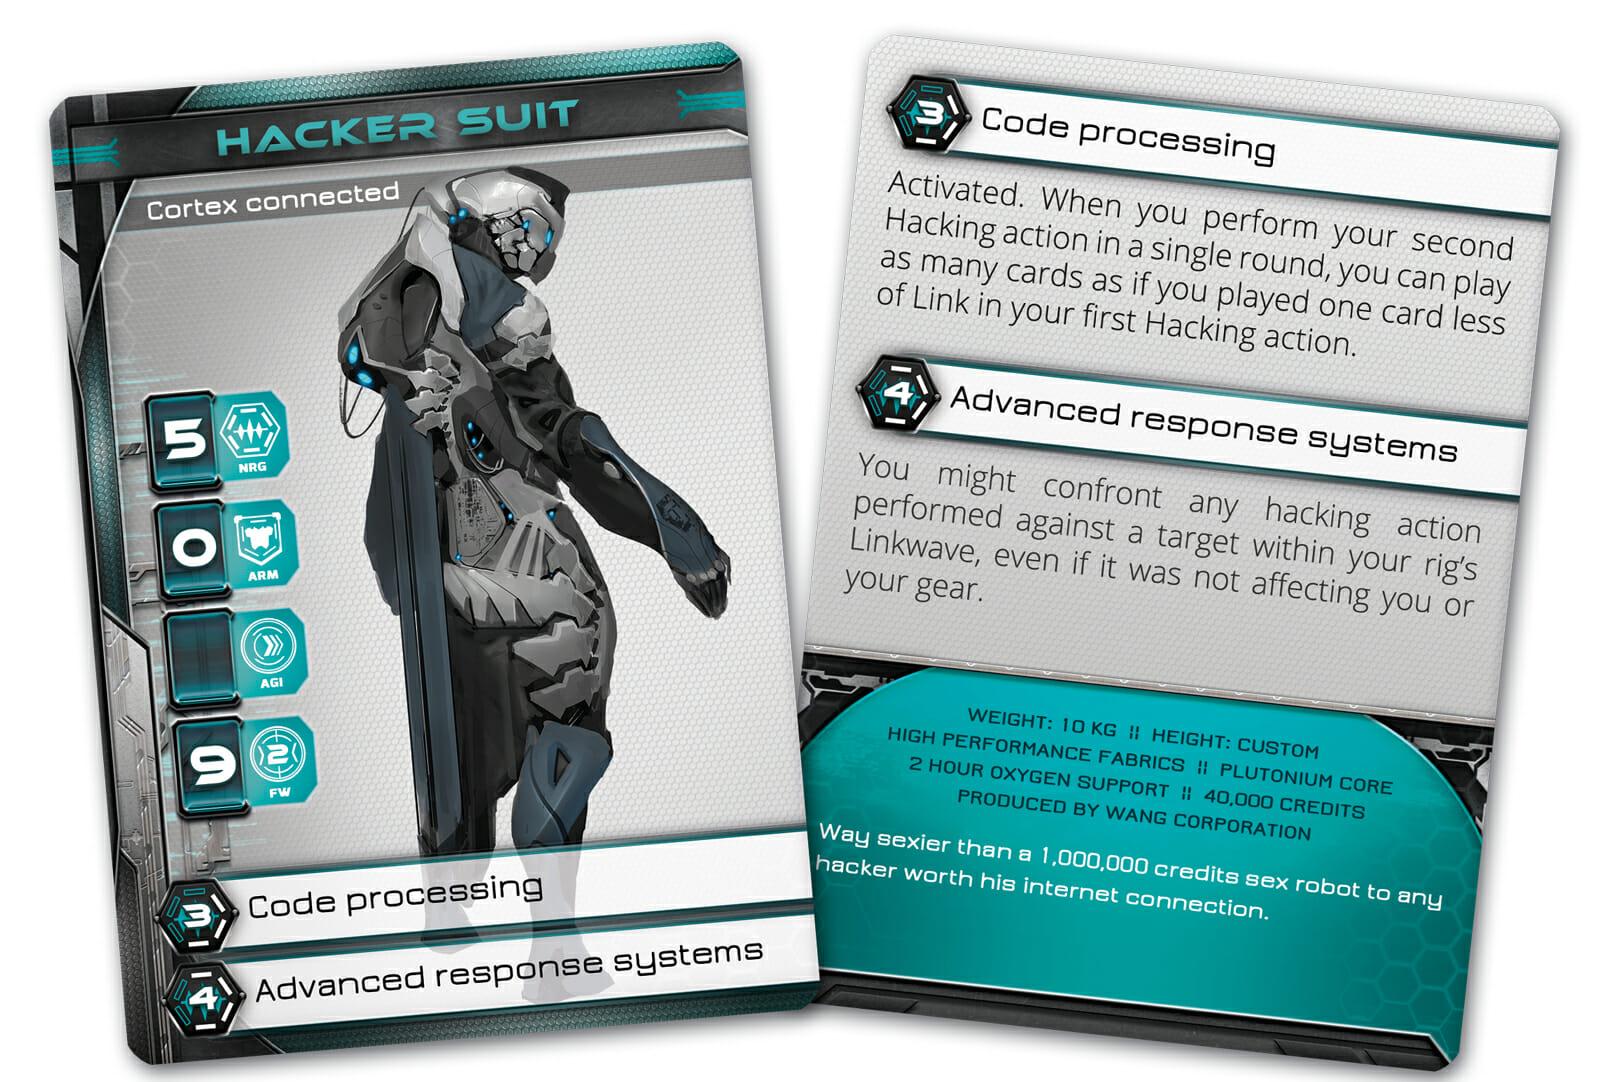 Hacker-suit